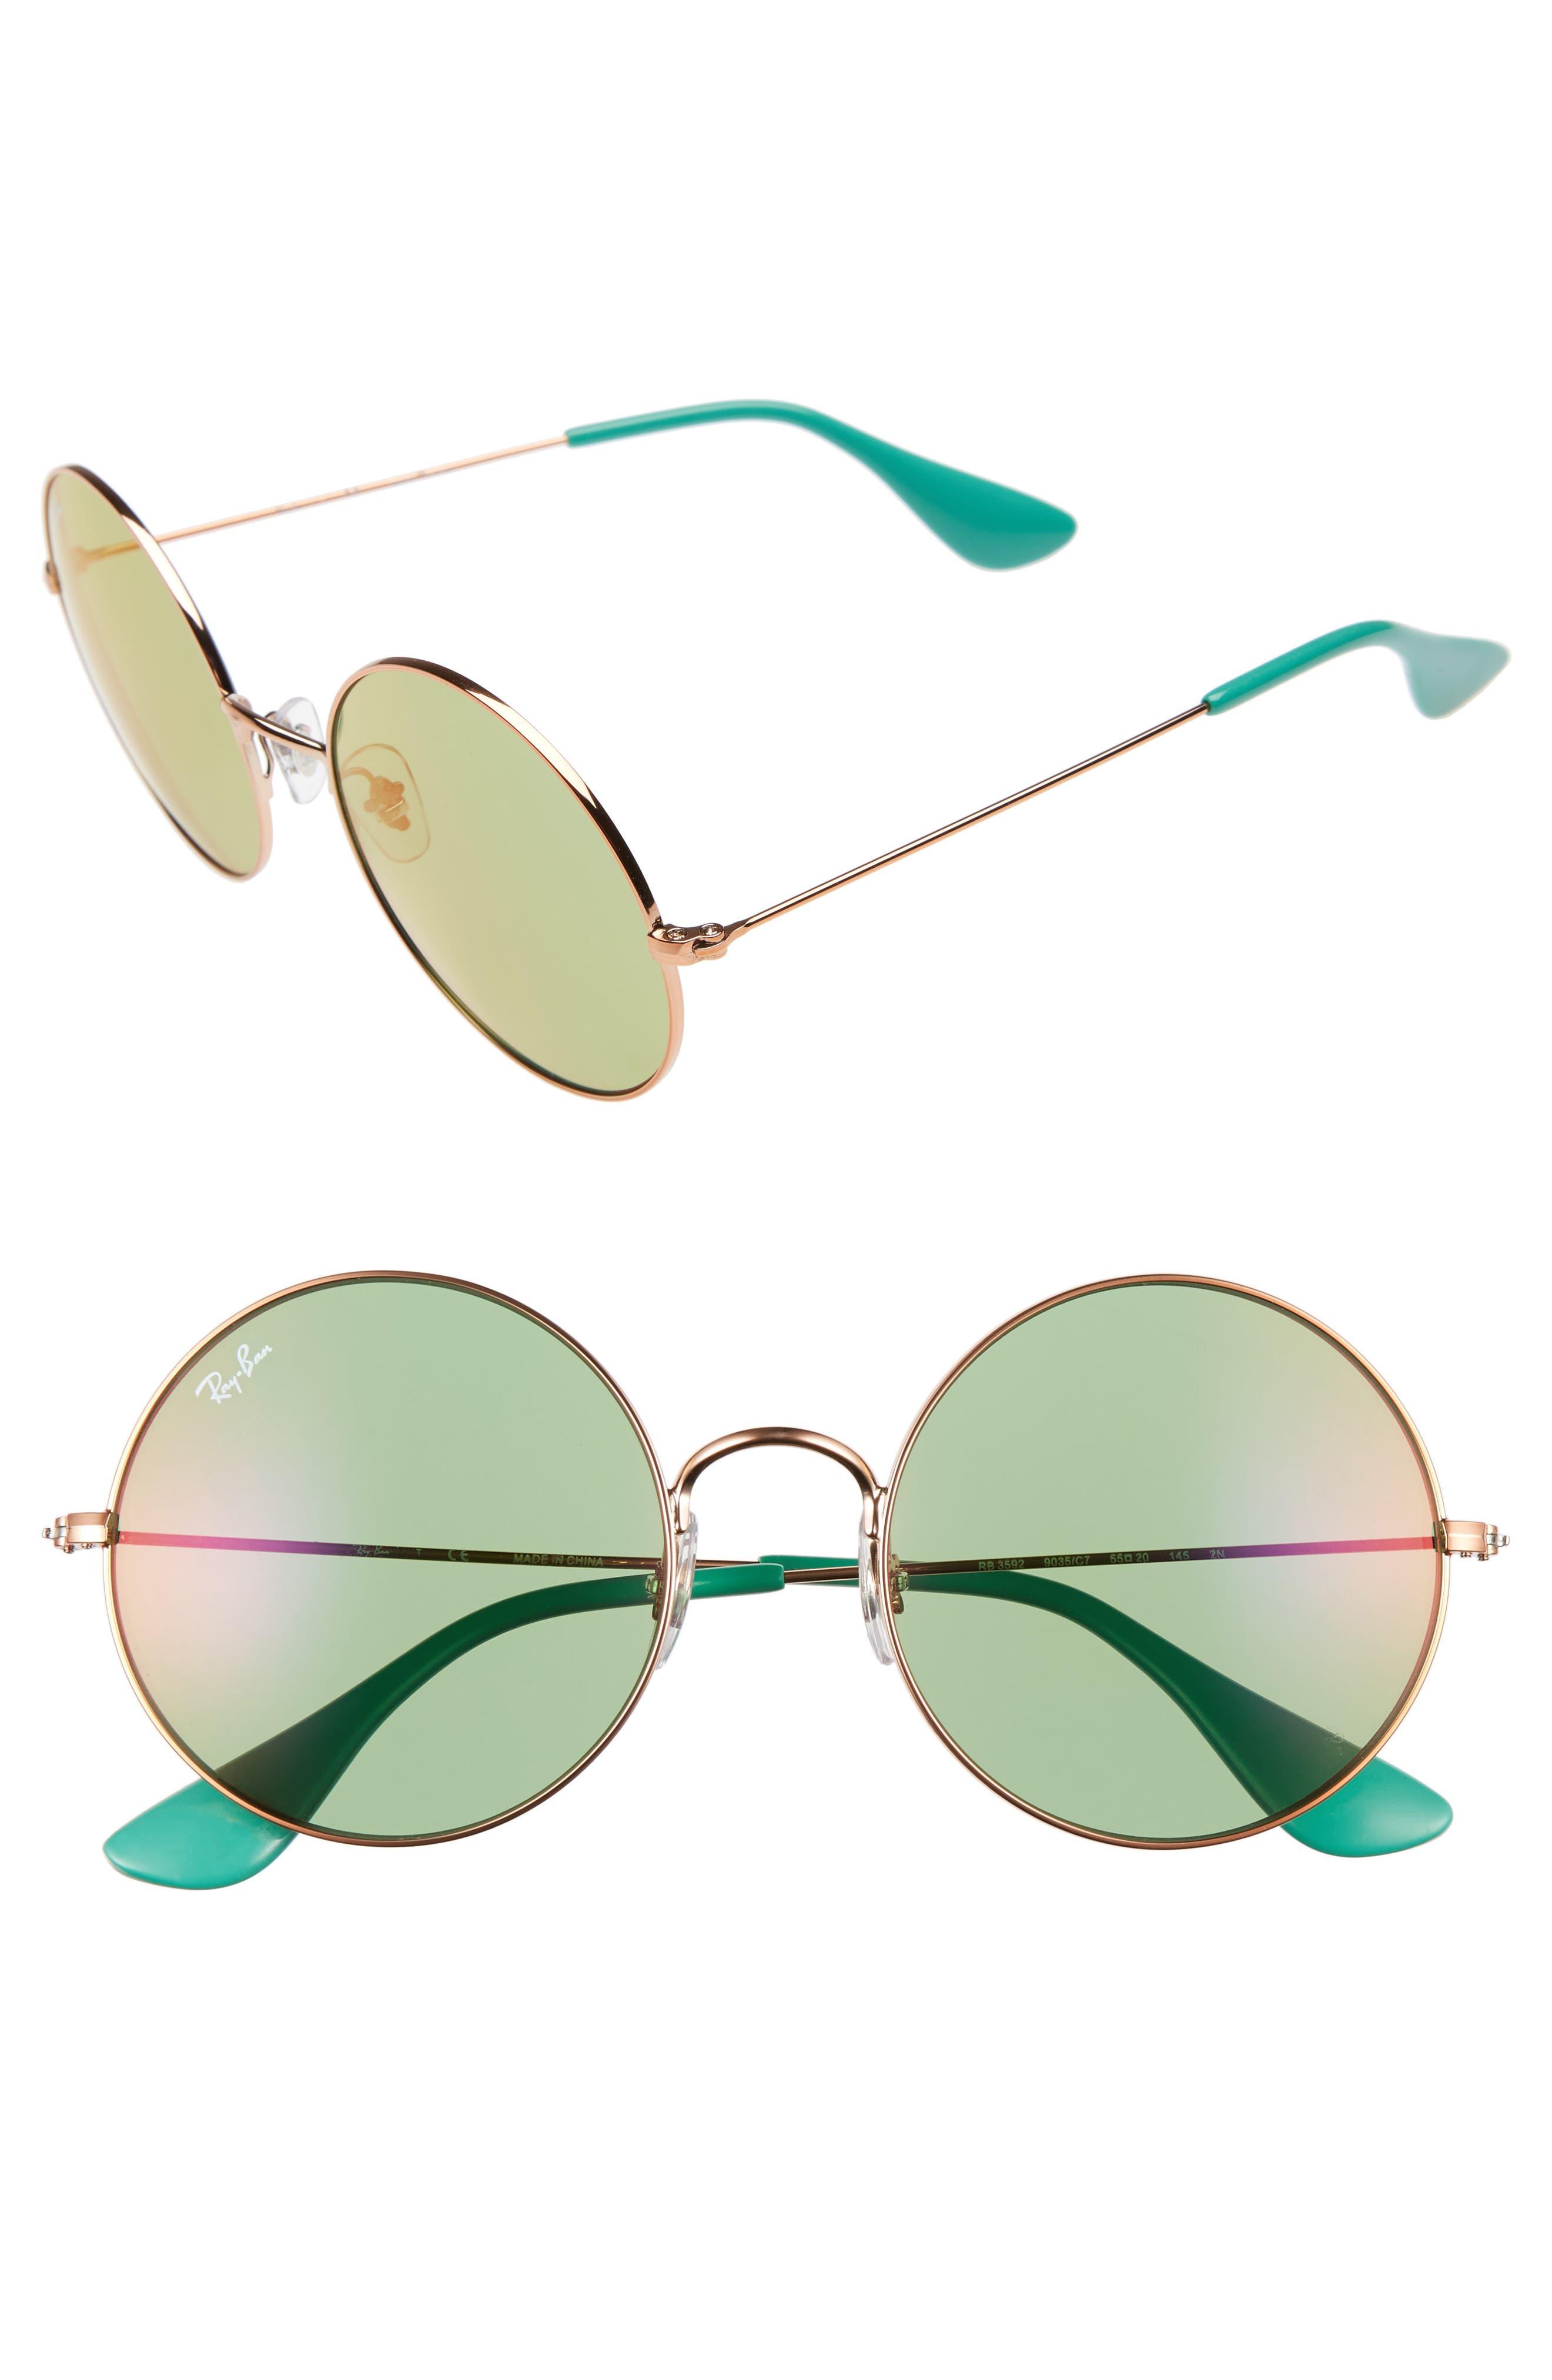 3592 54mm Sunglasses,                             Alternate thumbnail 2, color,                             710